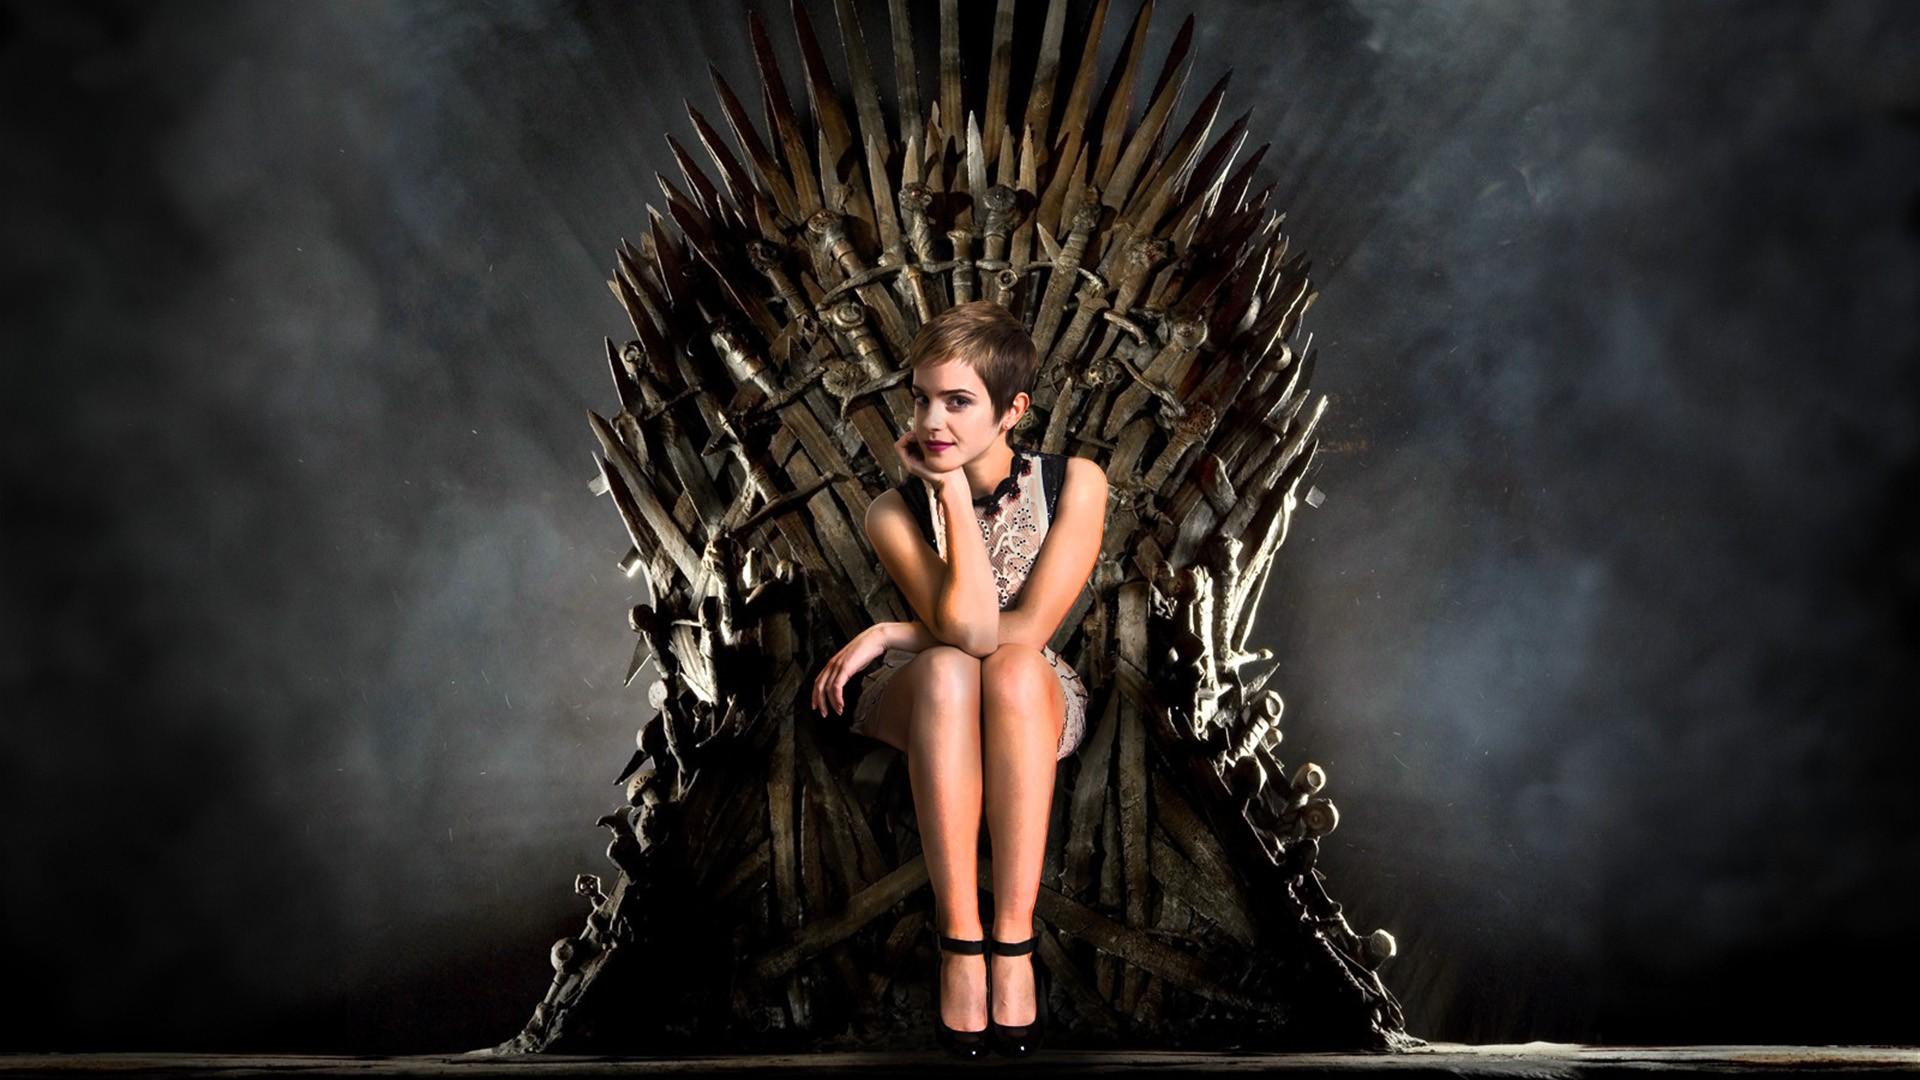 Game of Thrones Season 5 Wallpaper Download Desktop Wallpaper 1920x1080